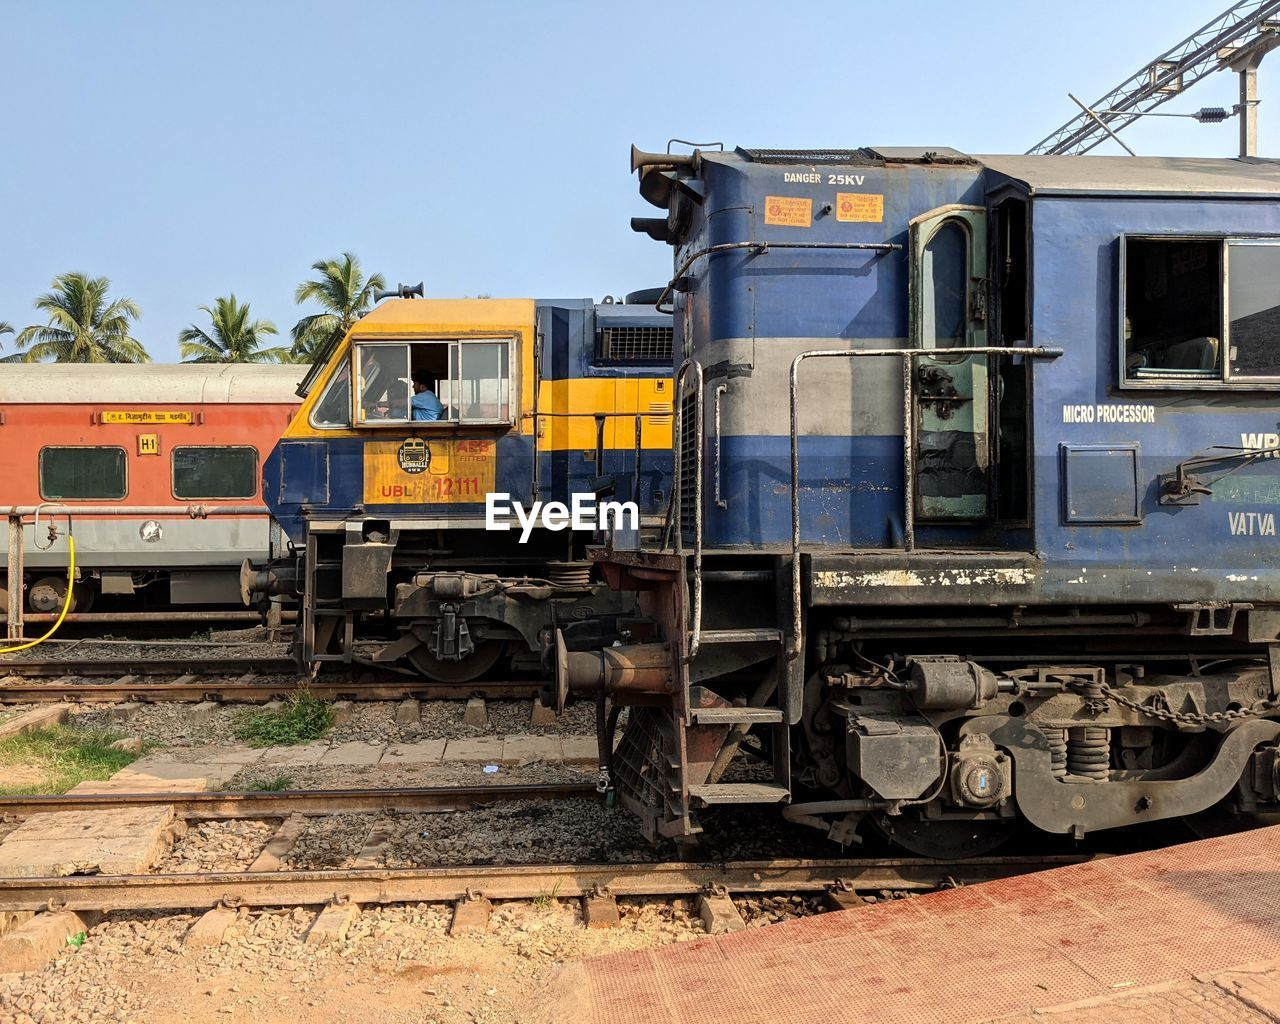 TRAIN ON RAILROAD TRACKS AGAINST CLEAR SKY